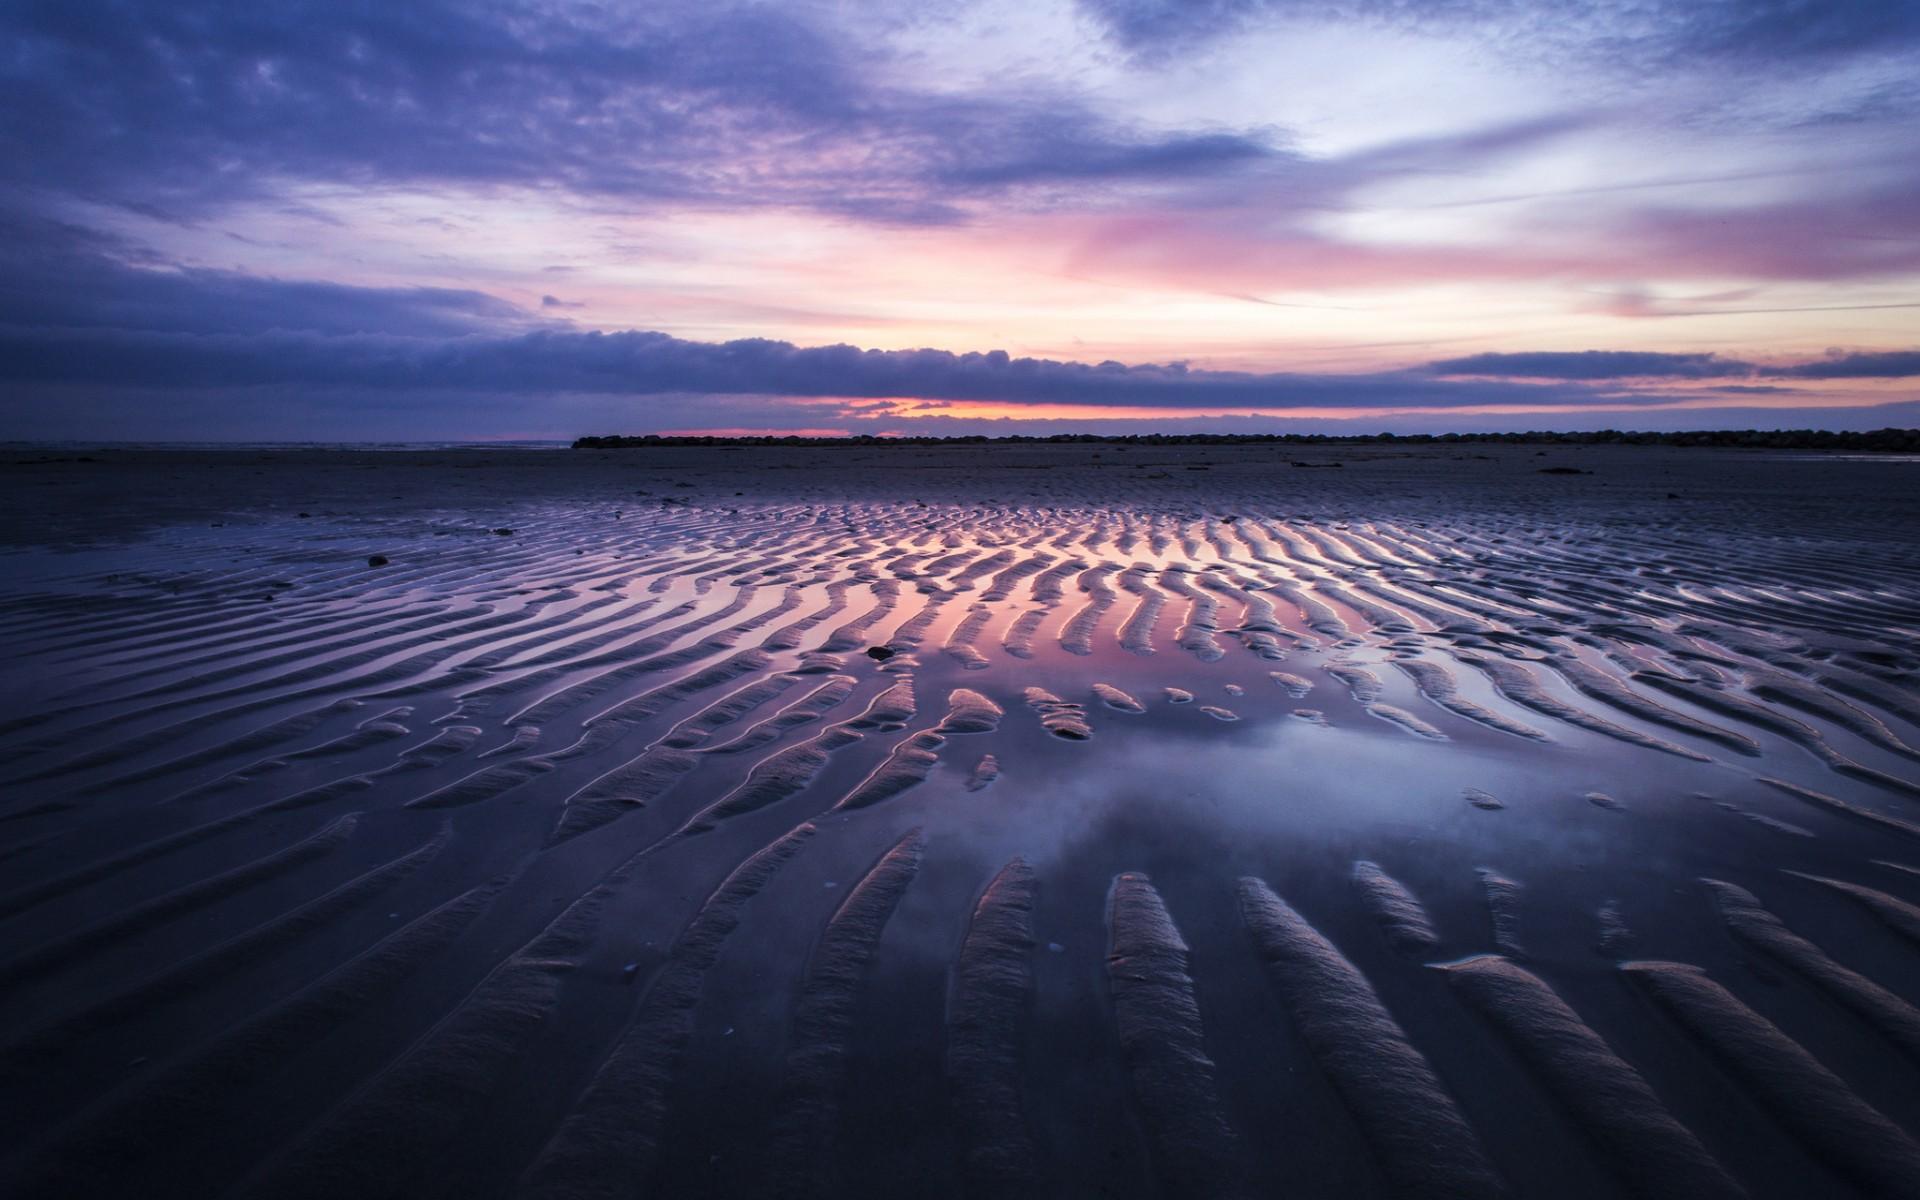 Desktop Wallpaper 176 – Spiaggia al tramonto